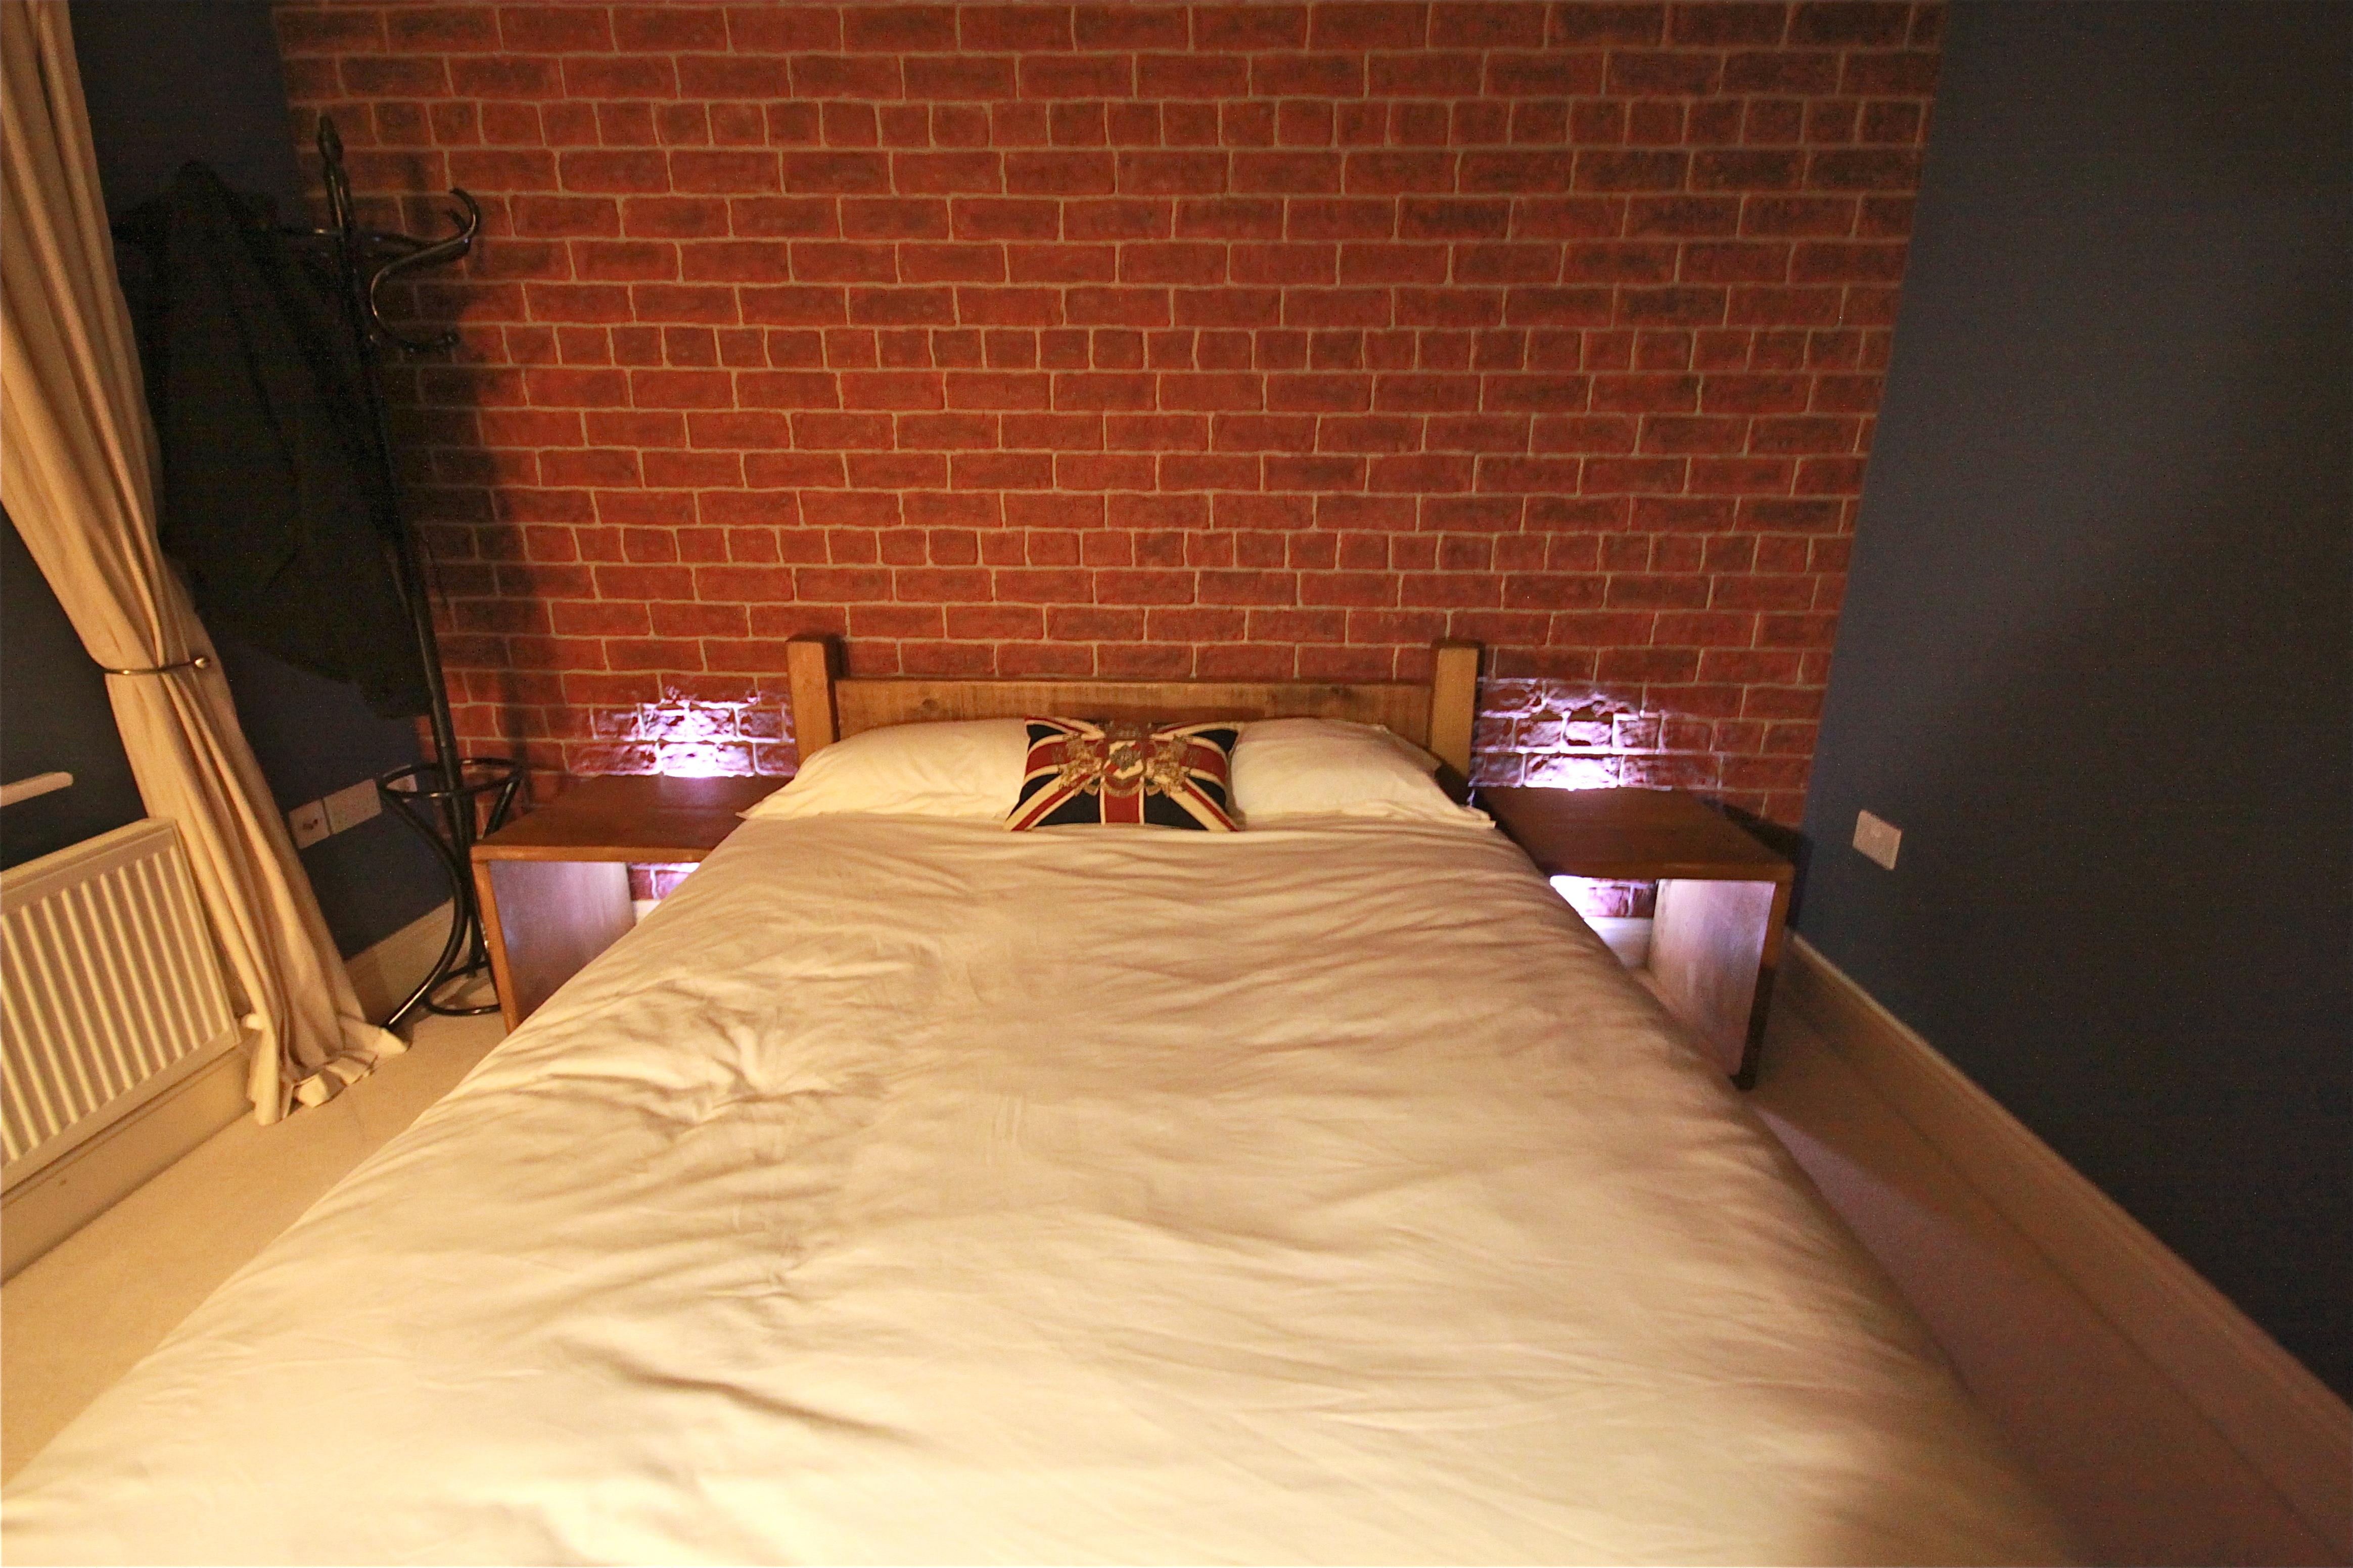 March 2011 39 dreamwall style blog 39 - Brick wallpaper bedroom design ...